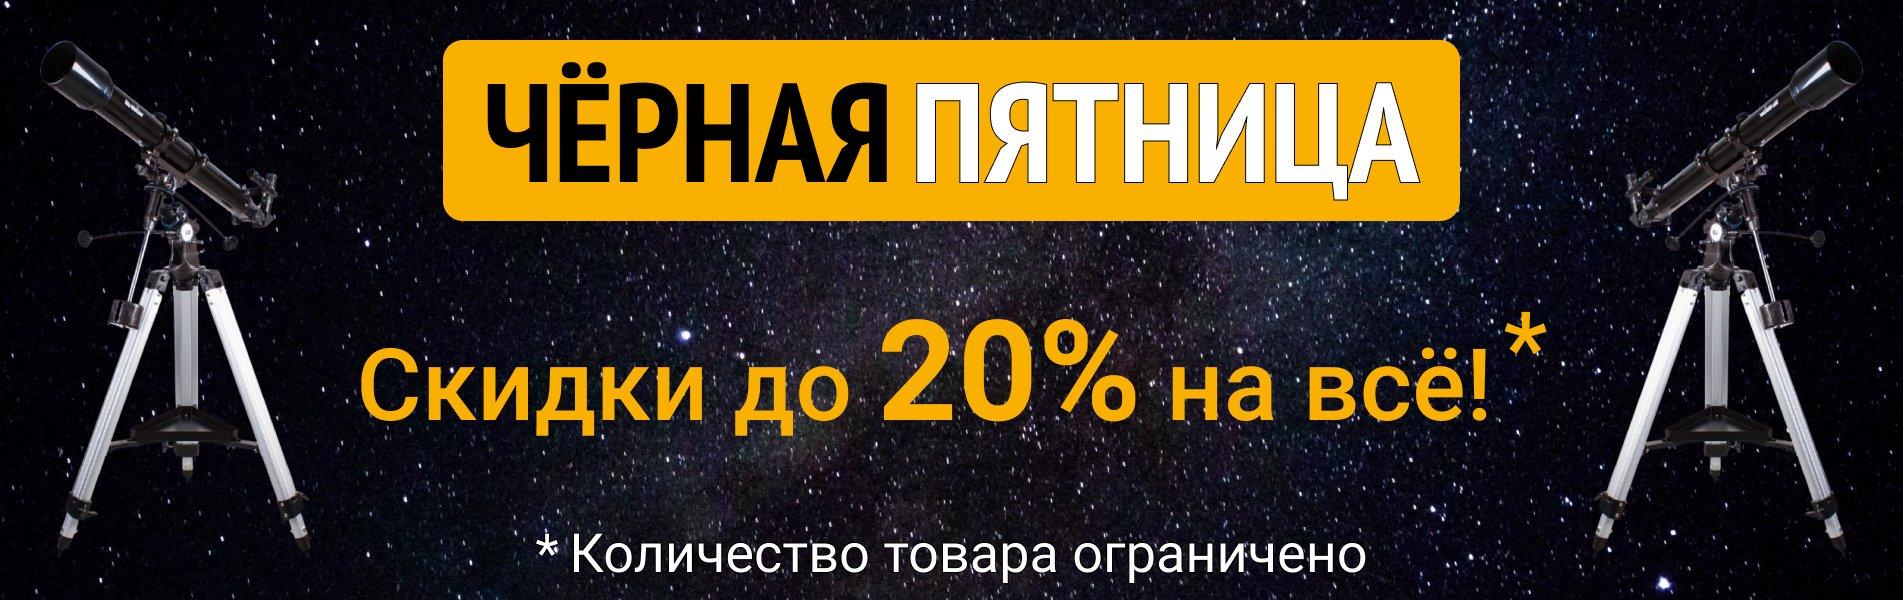 banner_black-friday-2020_sky-watcher